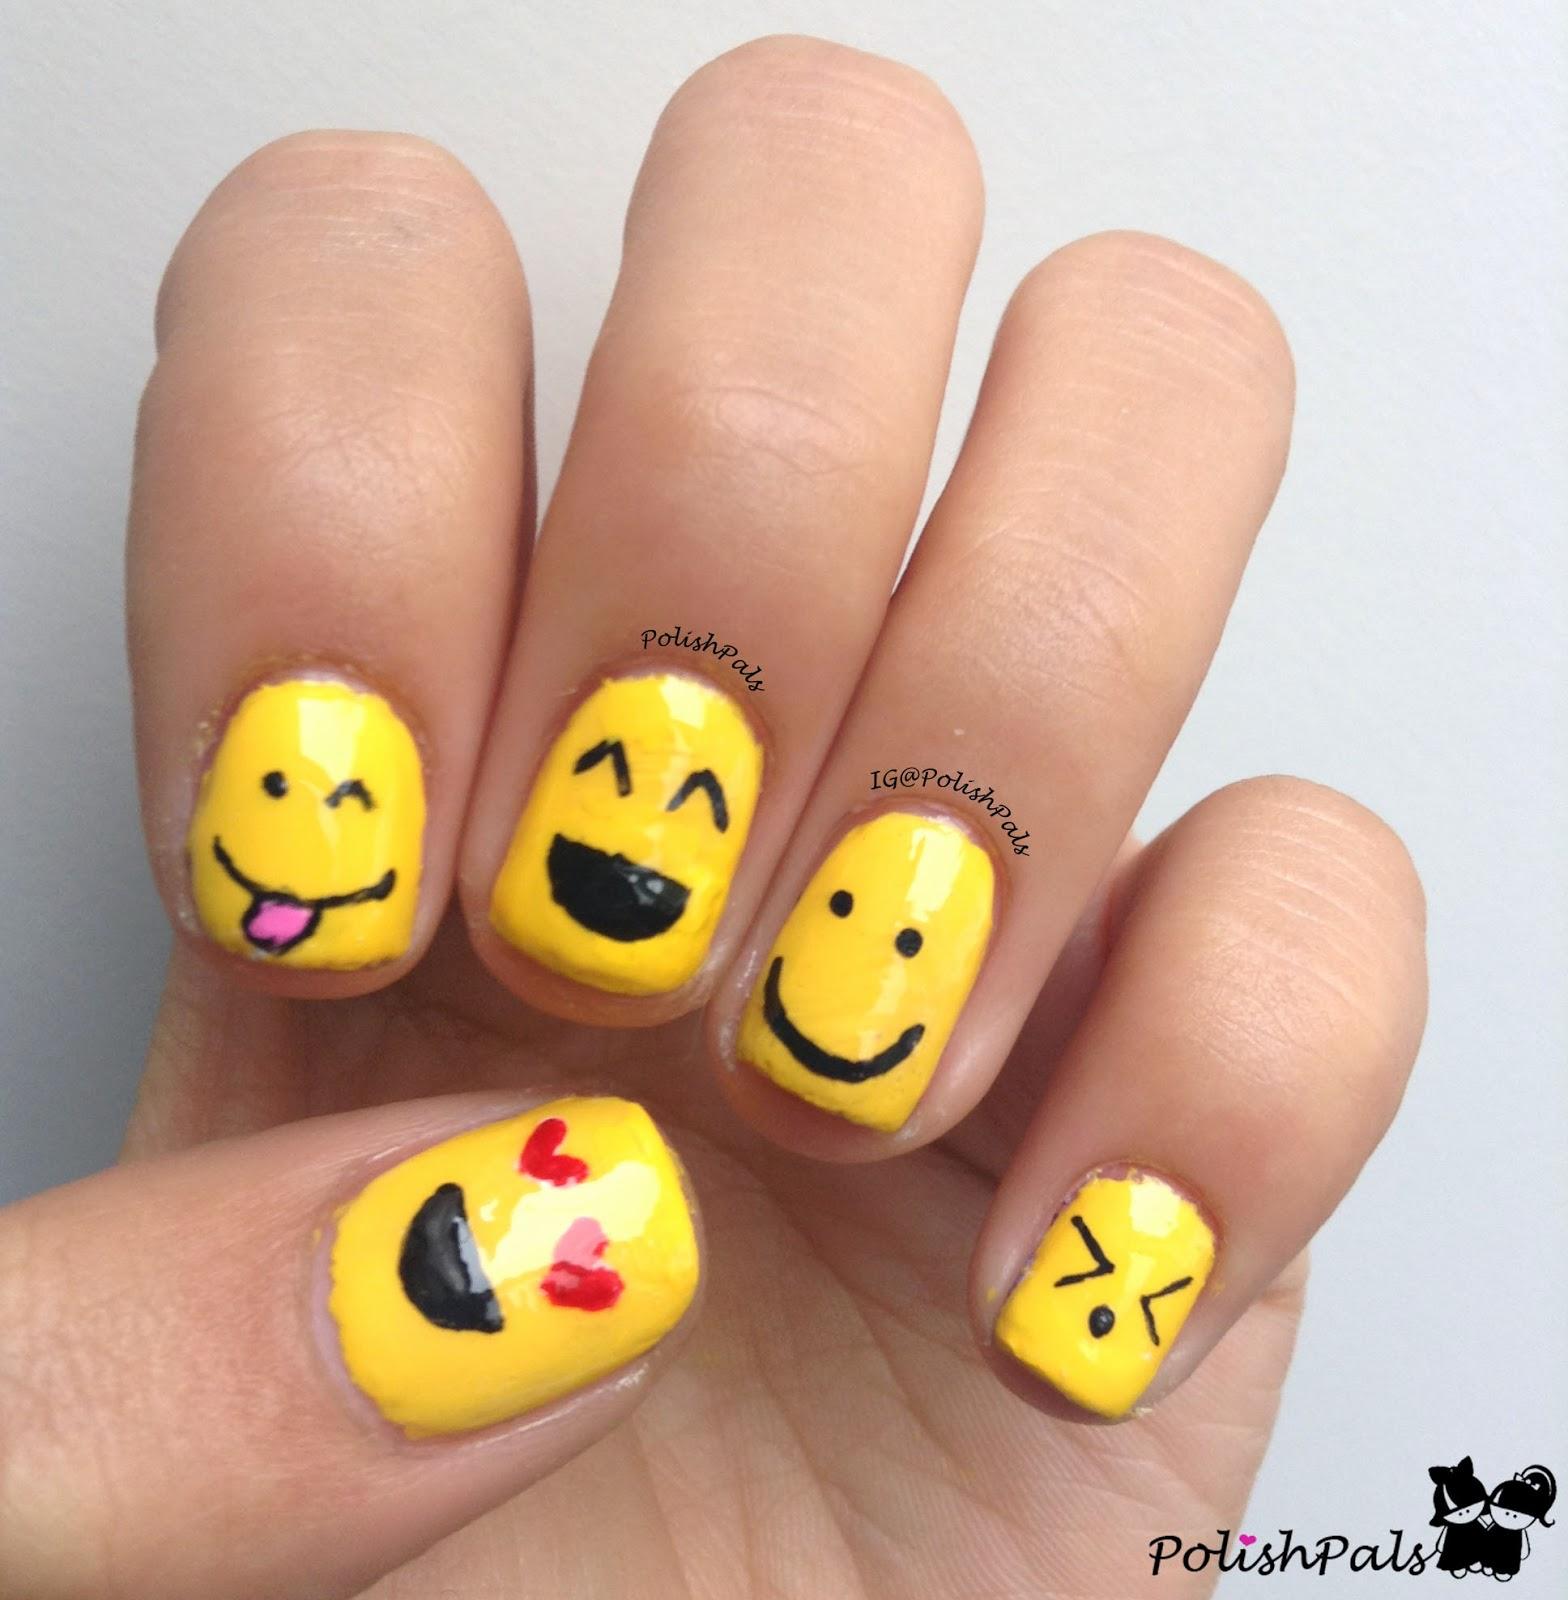 Emoticon Nail Polish To Bend Light